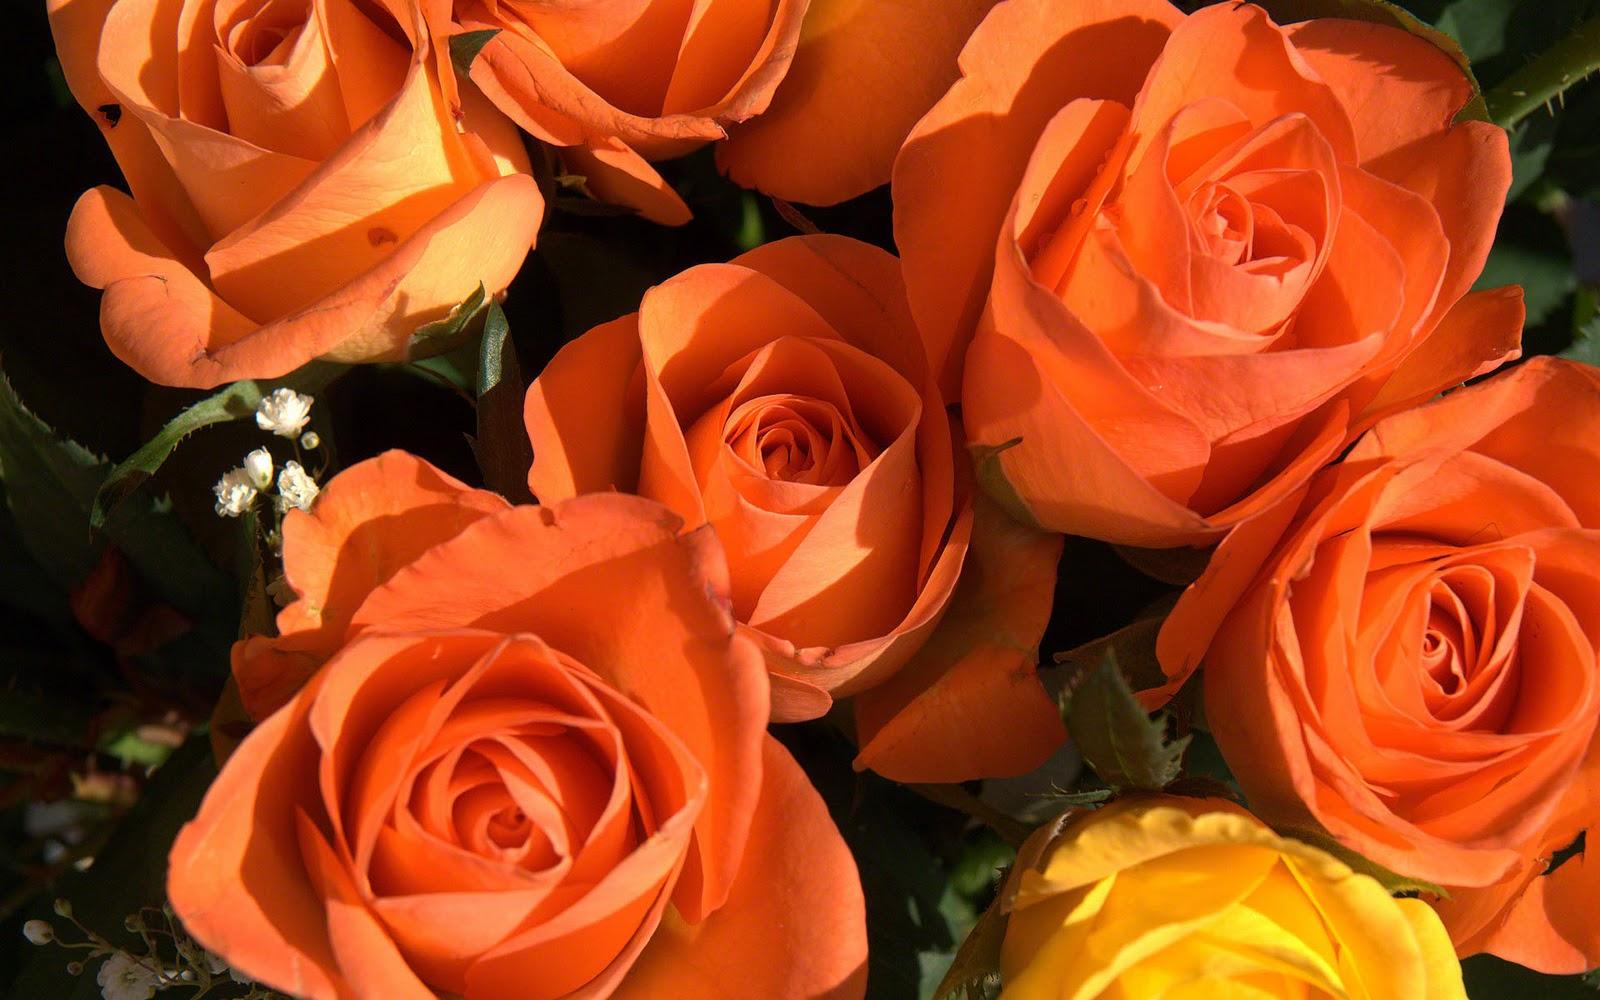 http://3.bp.blogspot.com/-hEx17dbz0yM/TZMxU_eppgI/AAAAAAAAAFI/3t3XDF6wGE0/s1600/roses-photo-wallpaper-02640.jpg